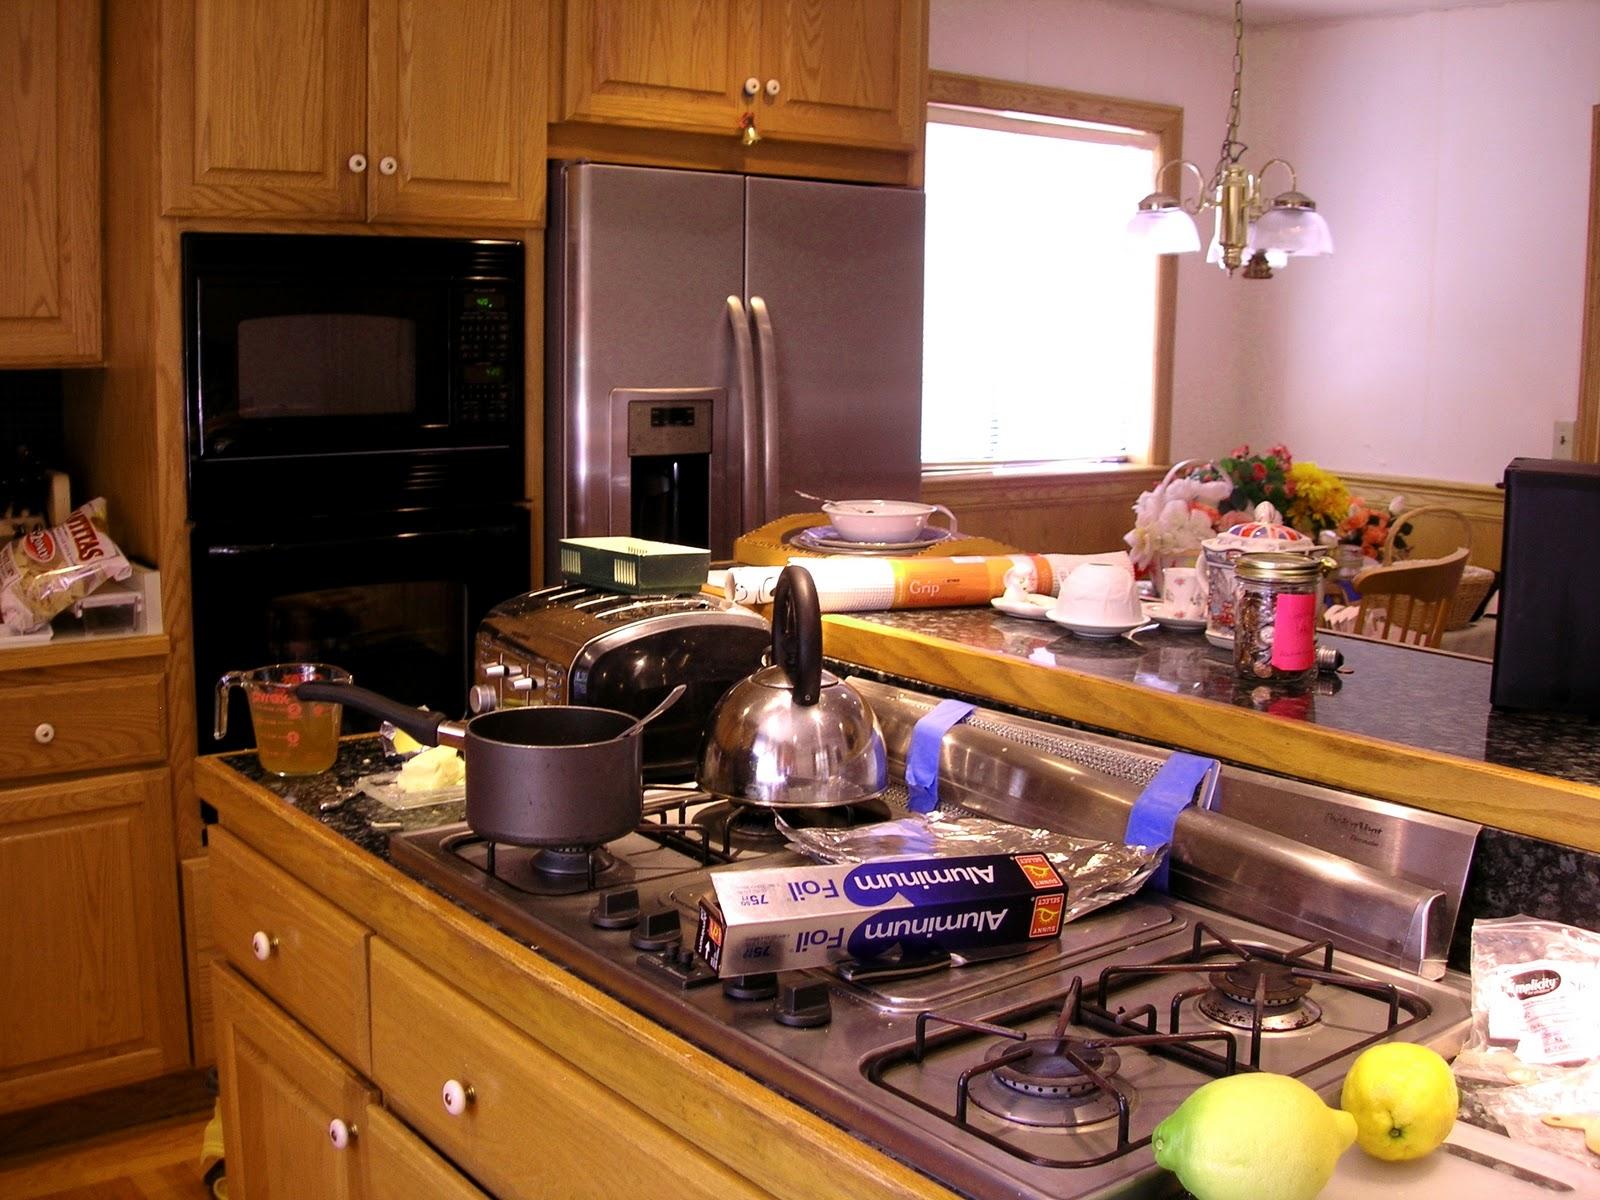 mukis kitchen christine vertical spit